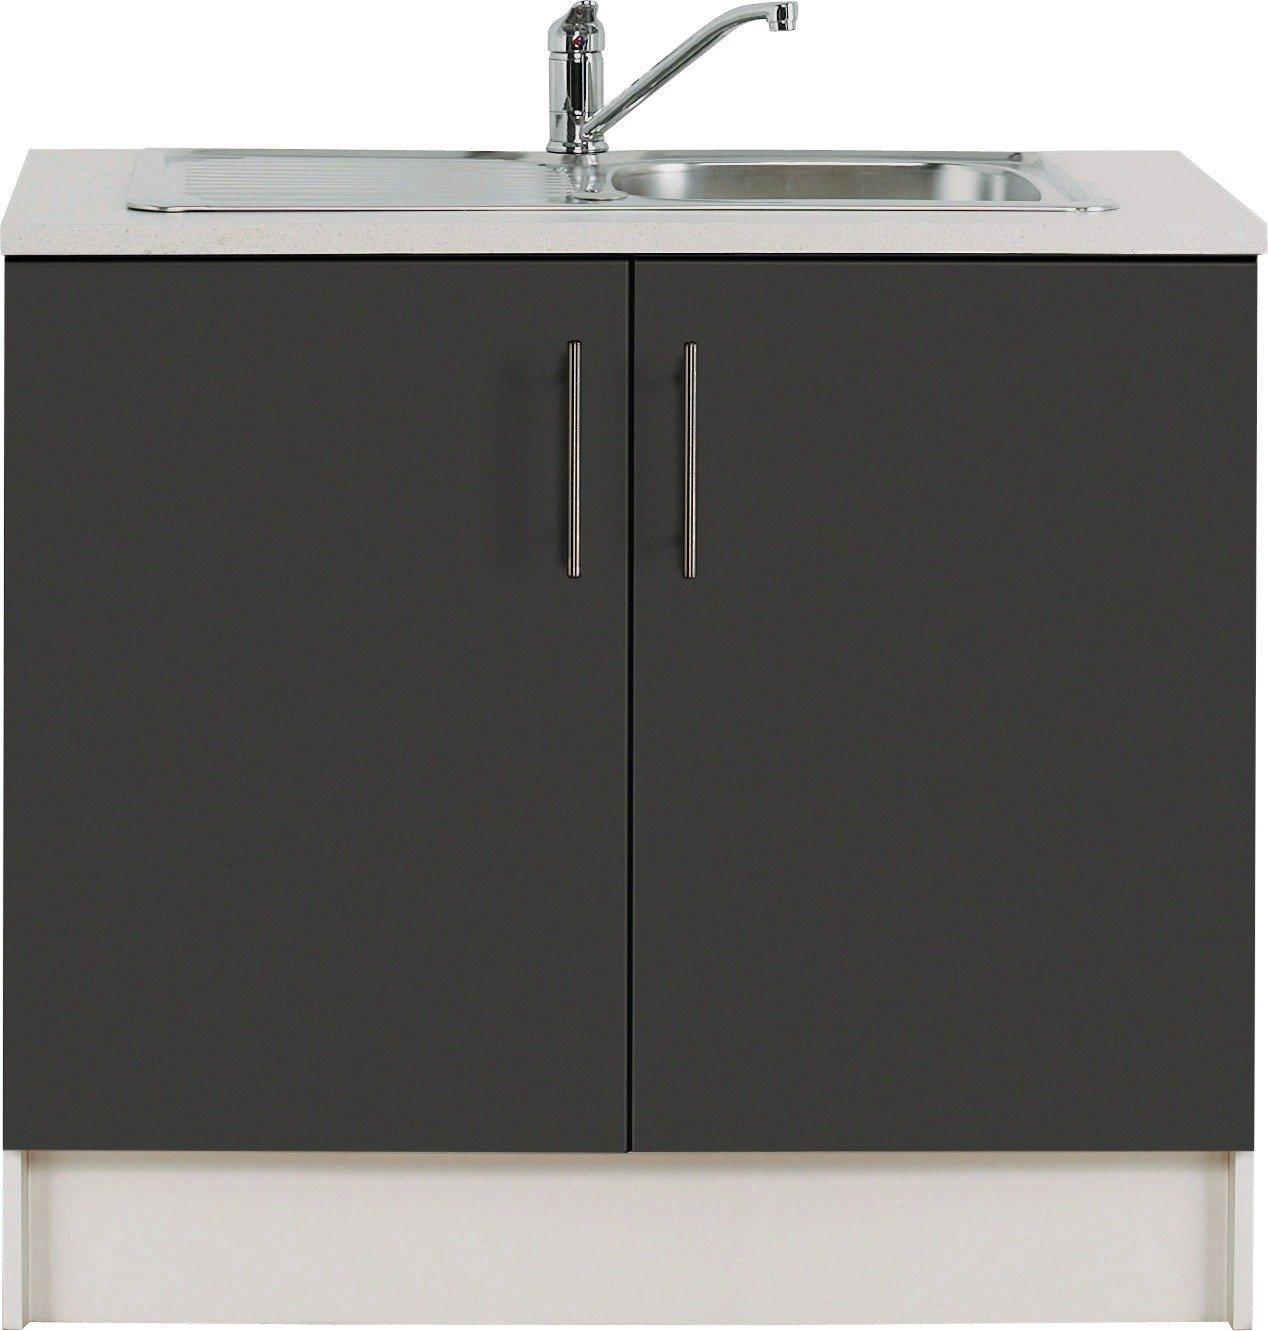 Hygena Athina - 1000mm S Steel - Kitchen Sink Unit - Black